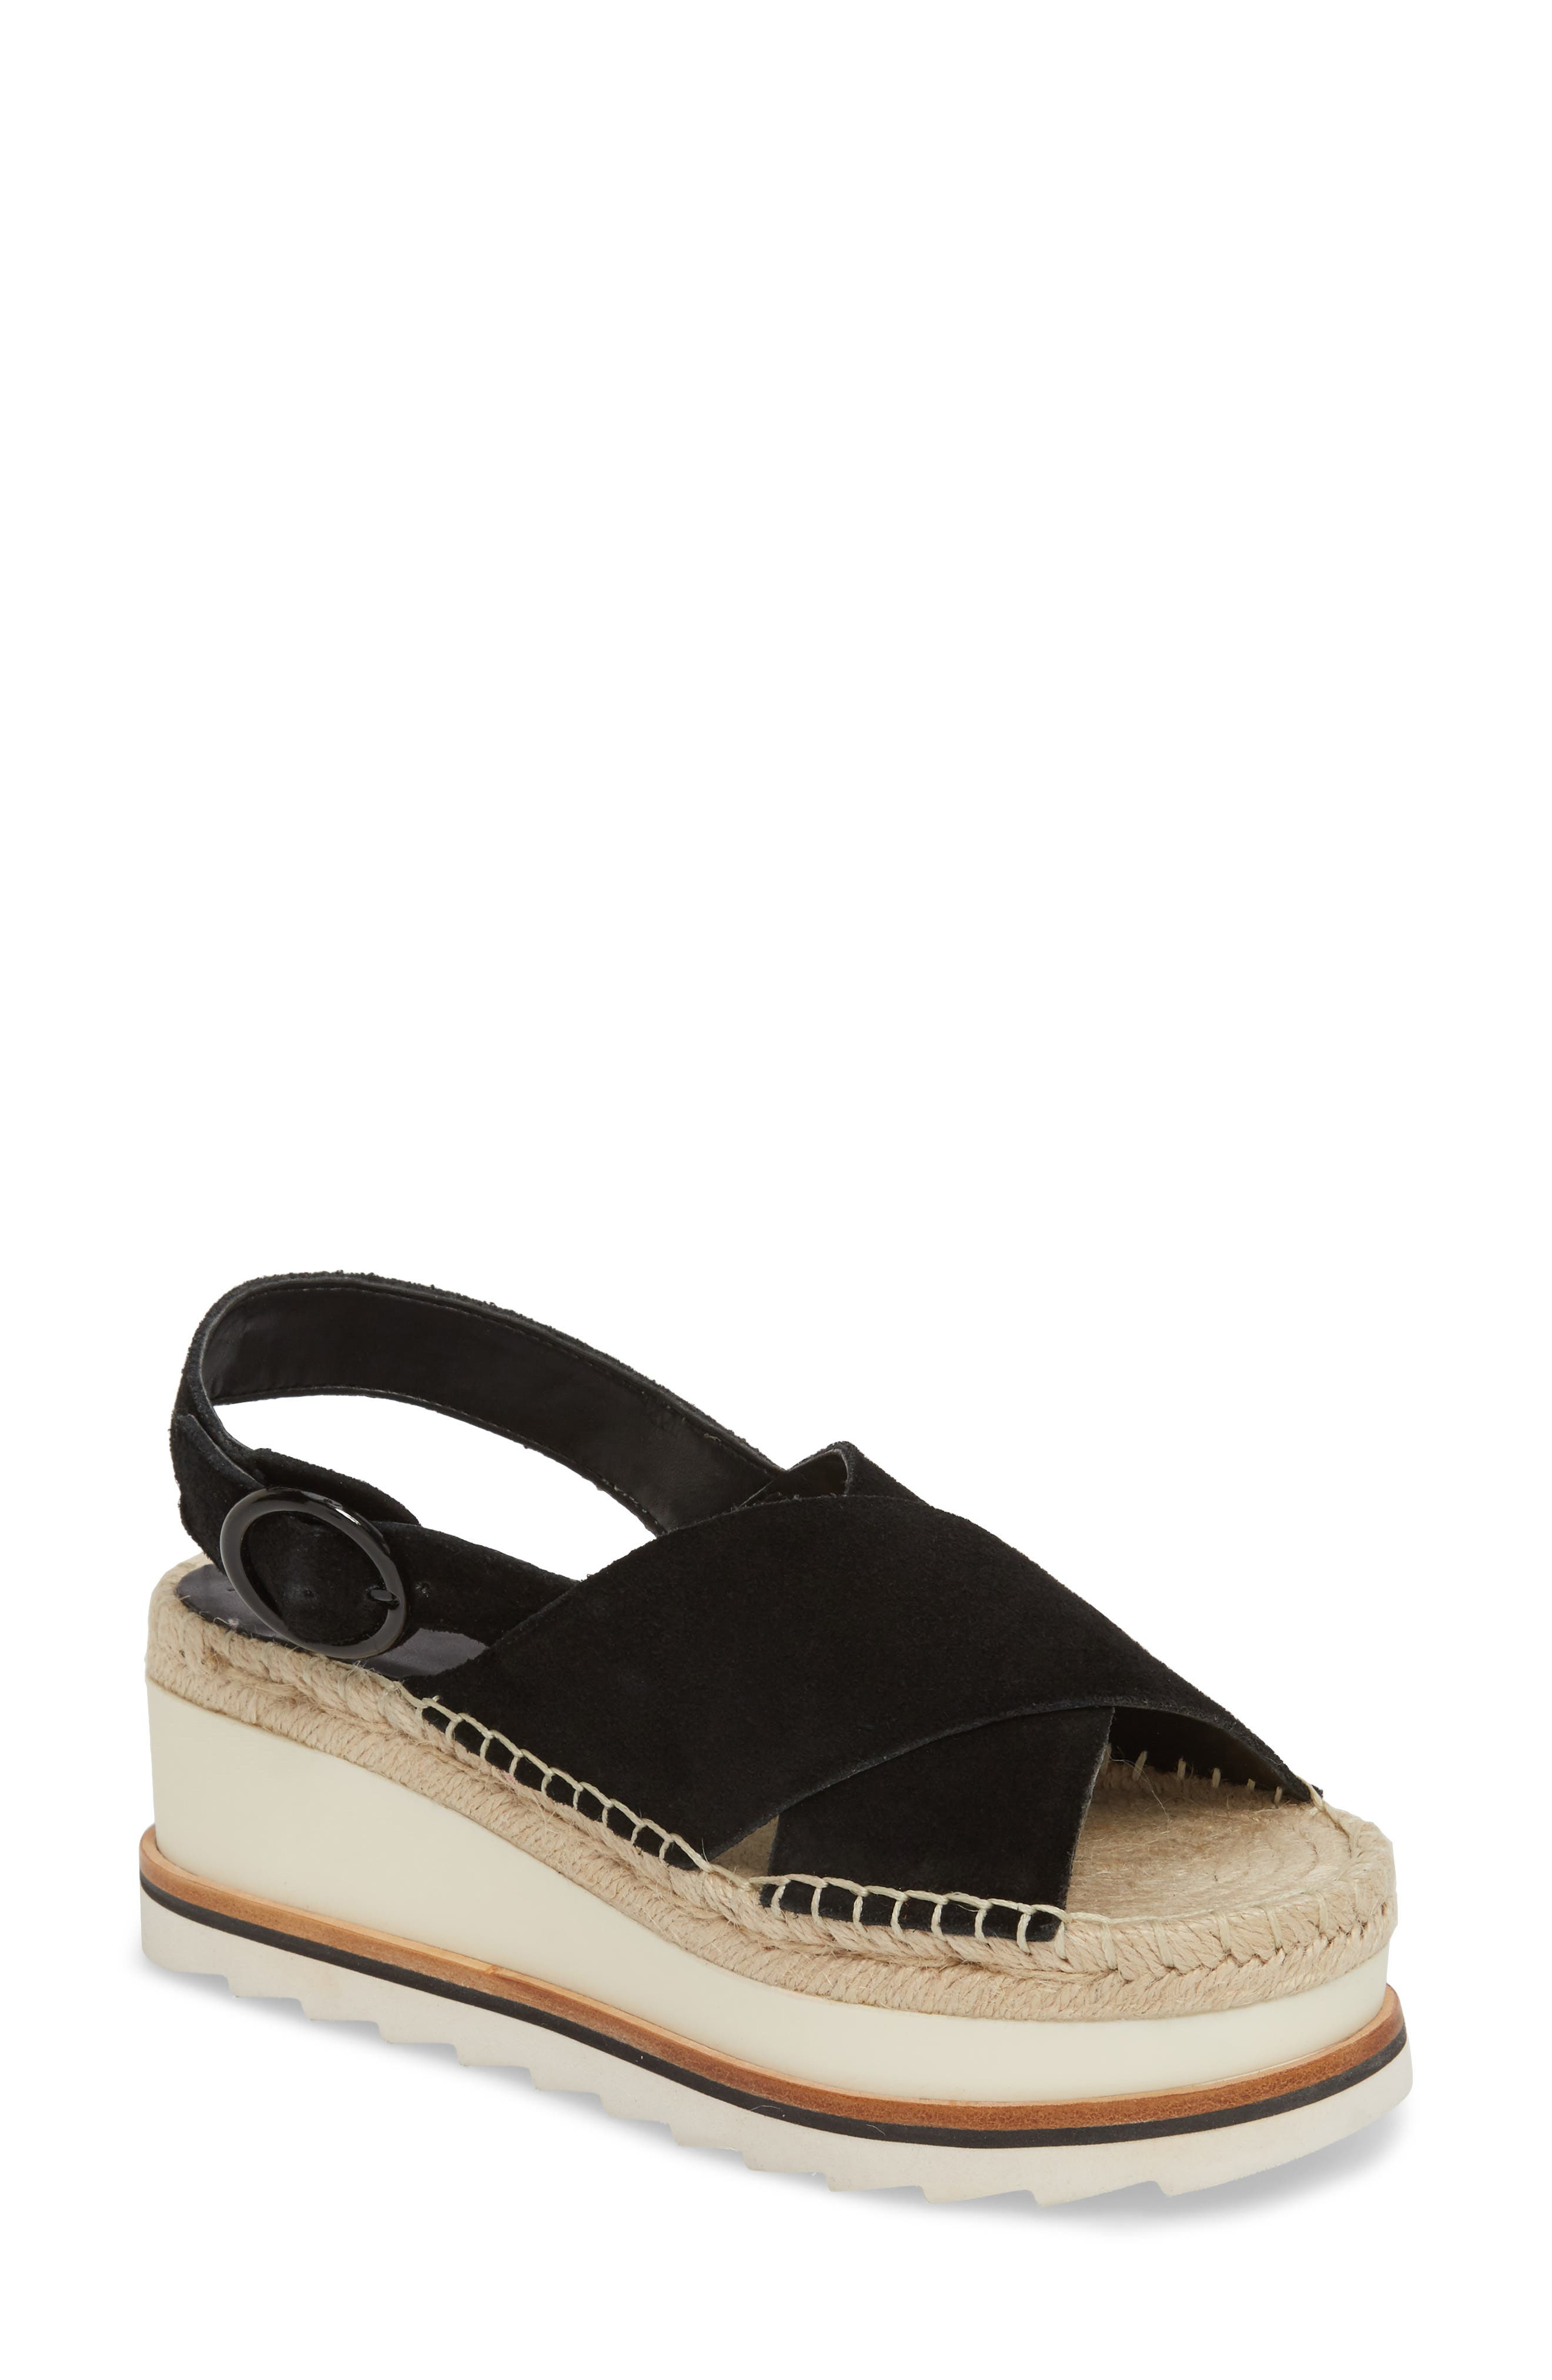 624cd134d81e Marc Fisher Ltd Glenna Platform Slingback Sandal- Black